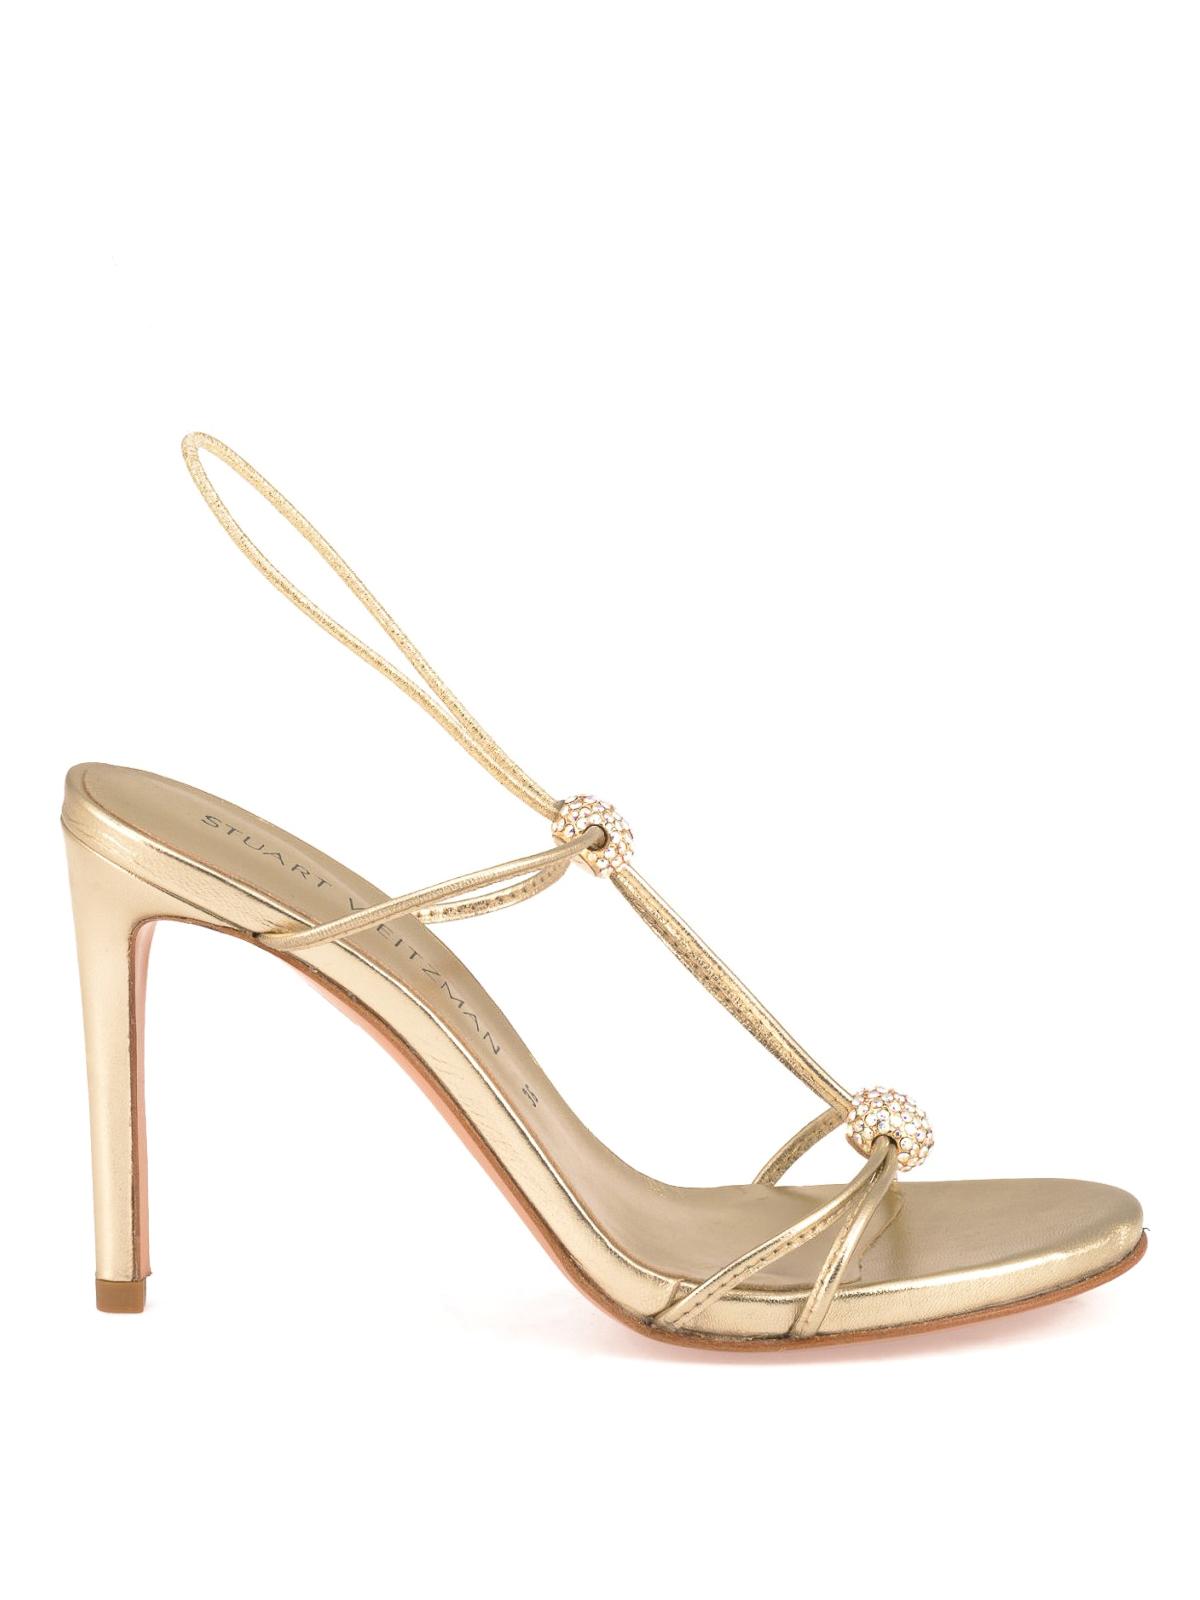 a8664675d3e3b Stuart Weitzman - Trixie embellished leather sandals - sandals ...